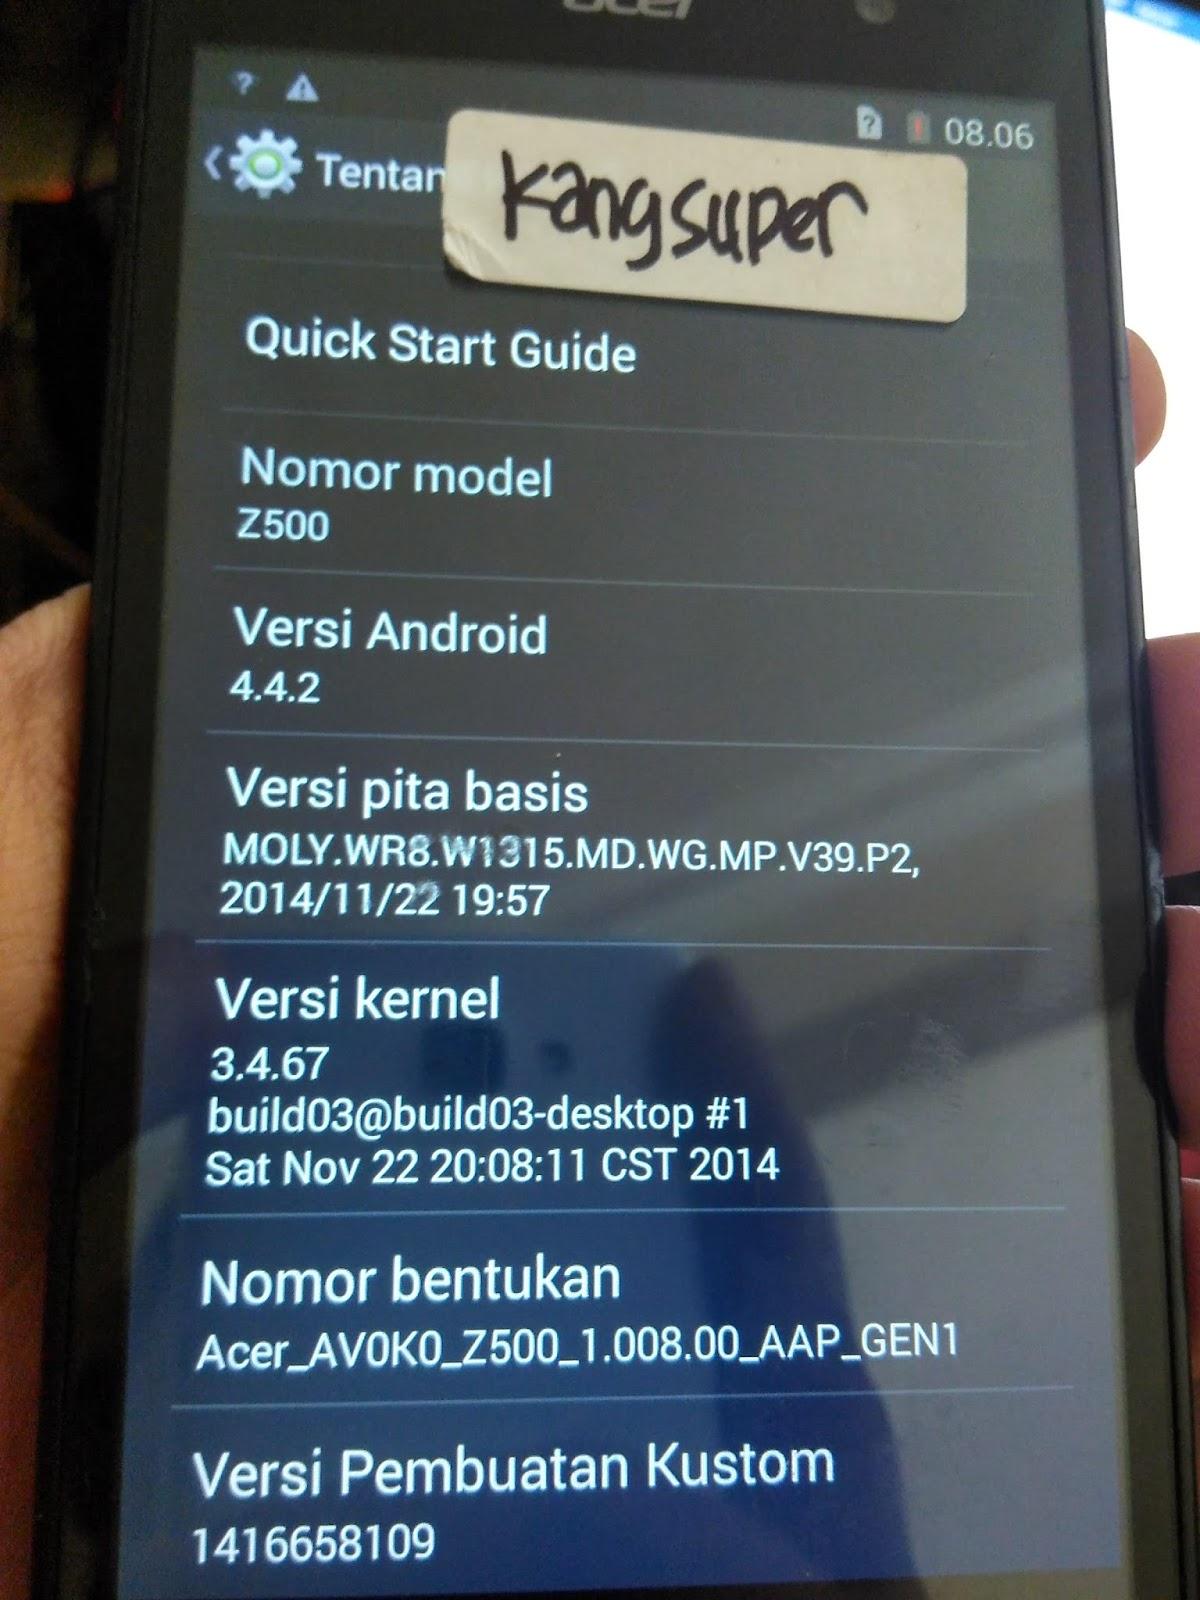 Firmware Acer Z200 Dual Sim Bahasa Indonesia : firmware, bahasa, indonesia, KangSuper